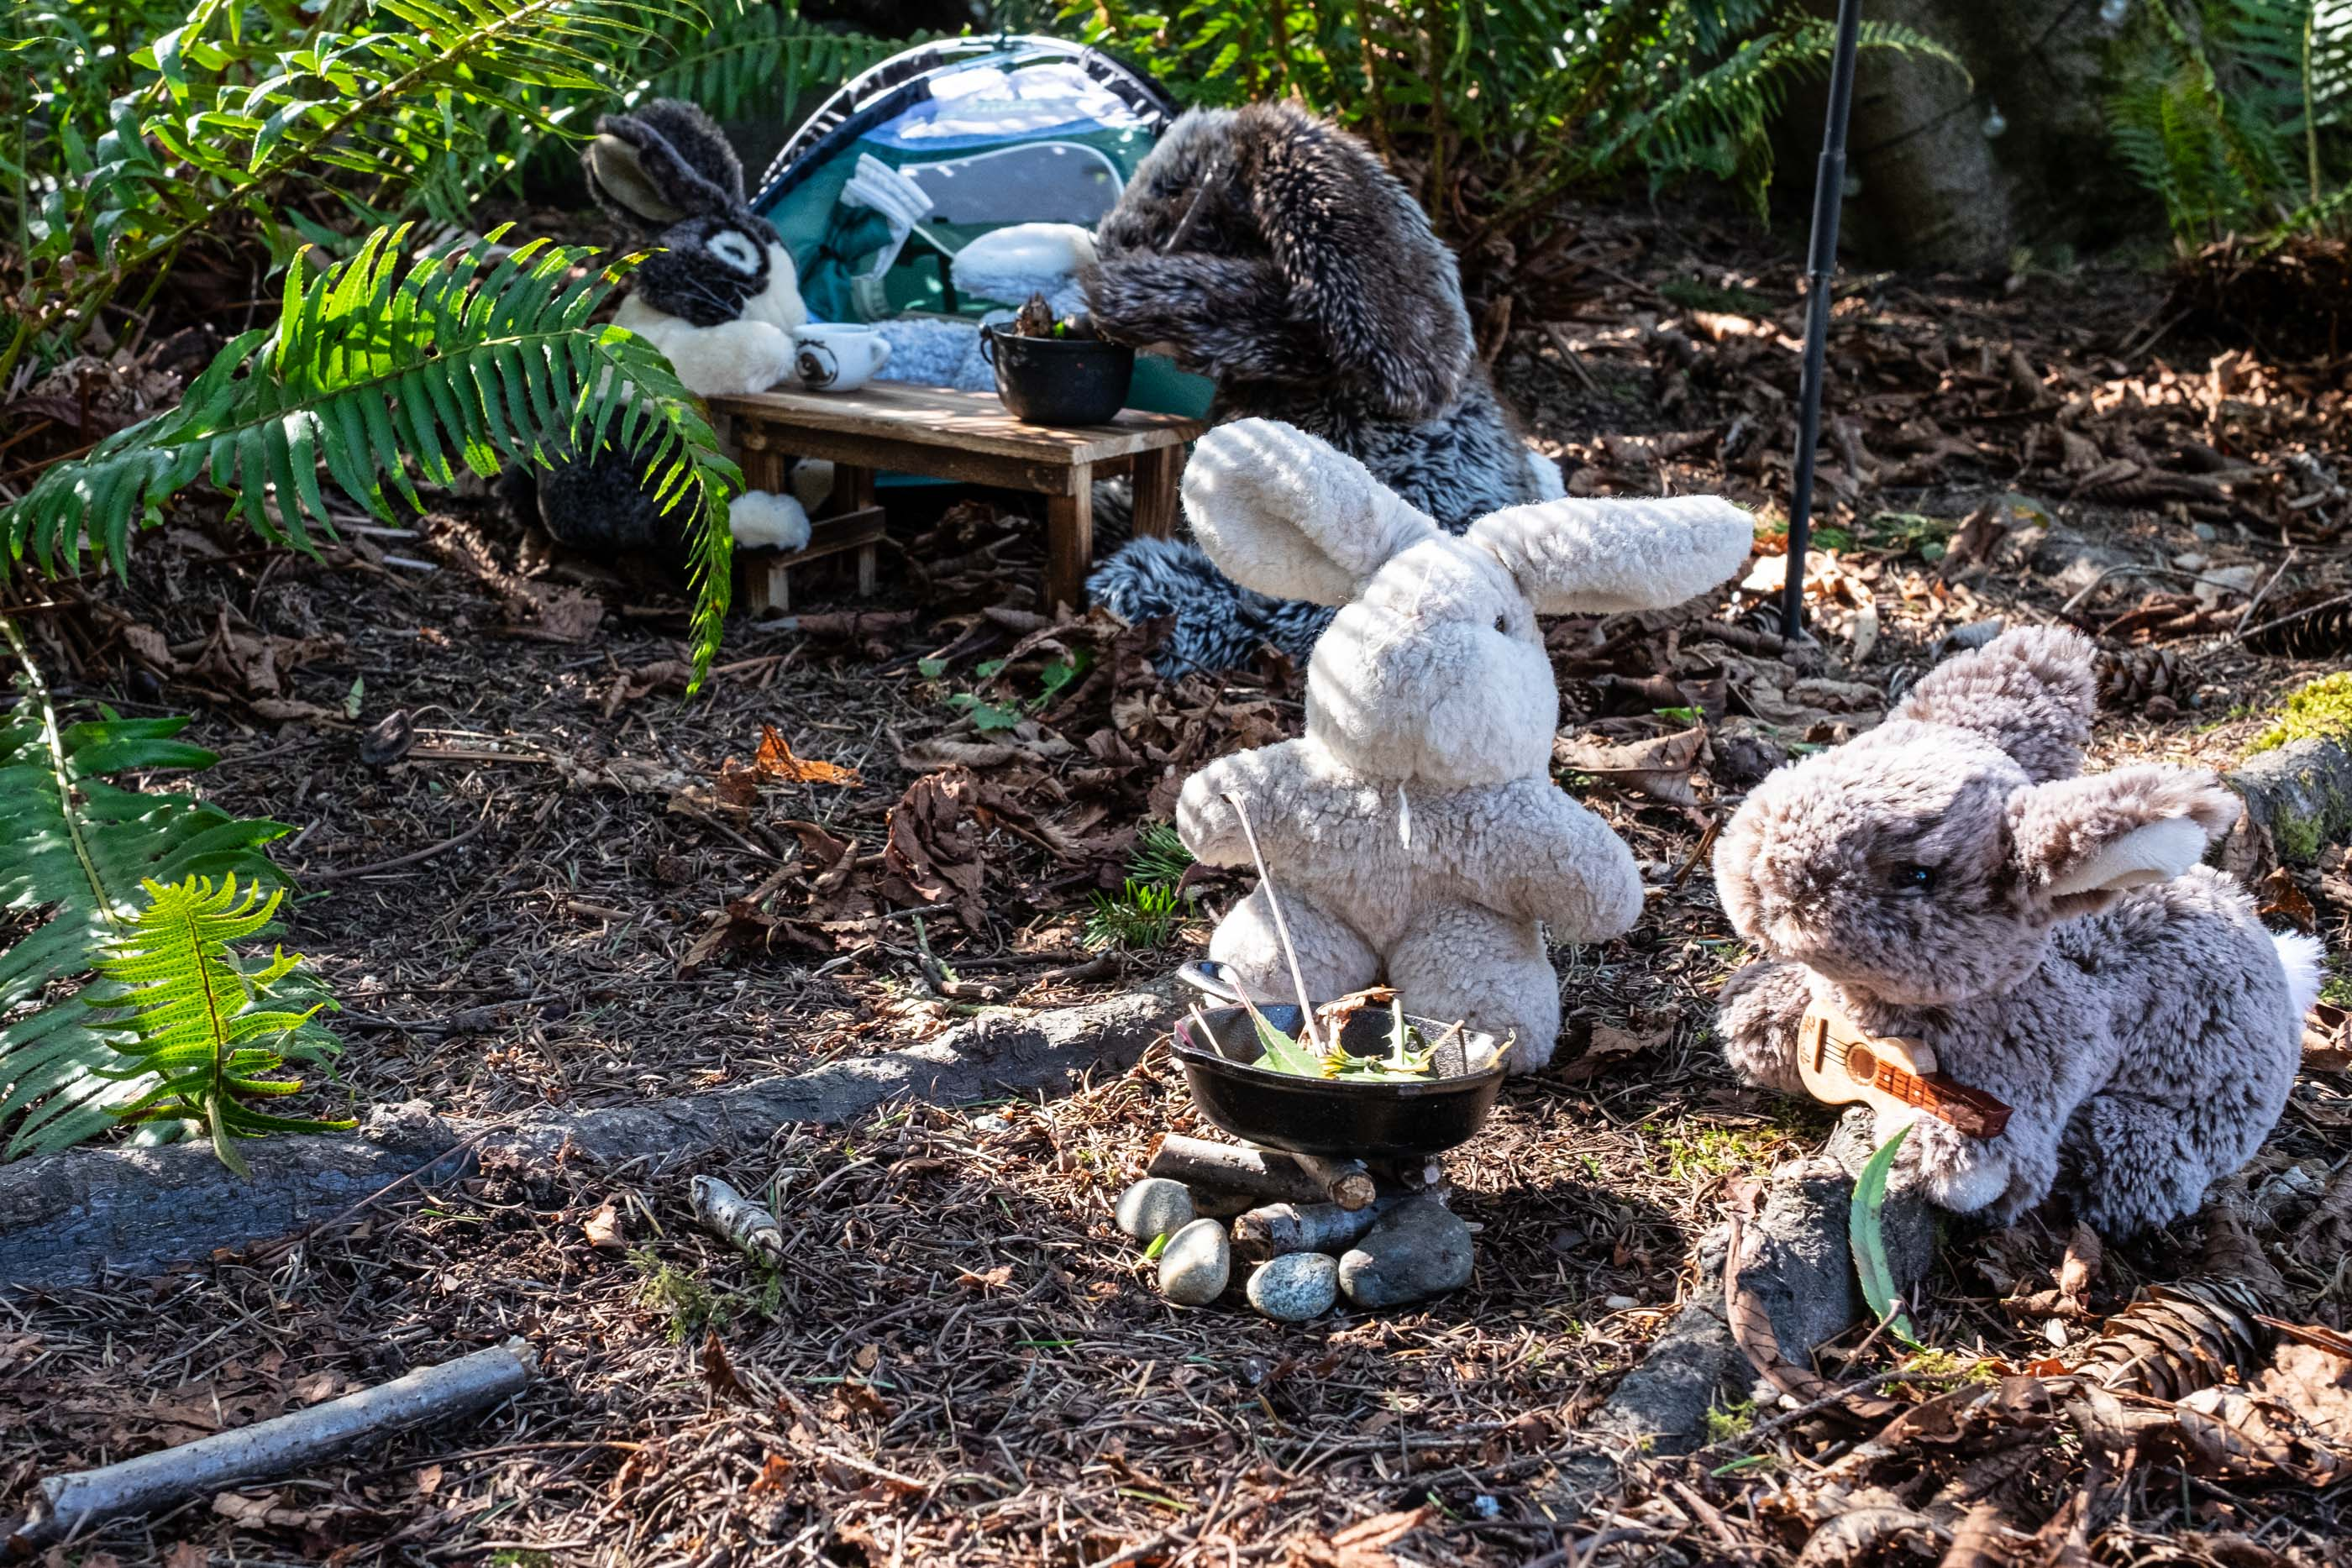 bunnies having a campfire